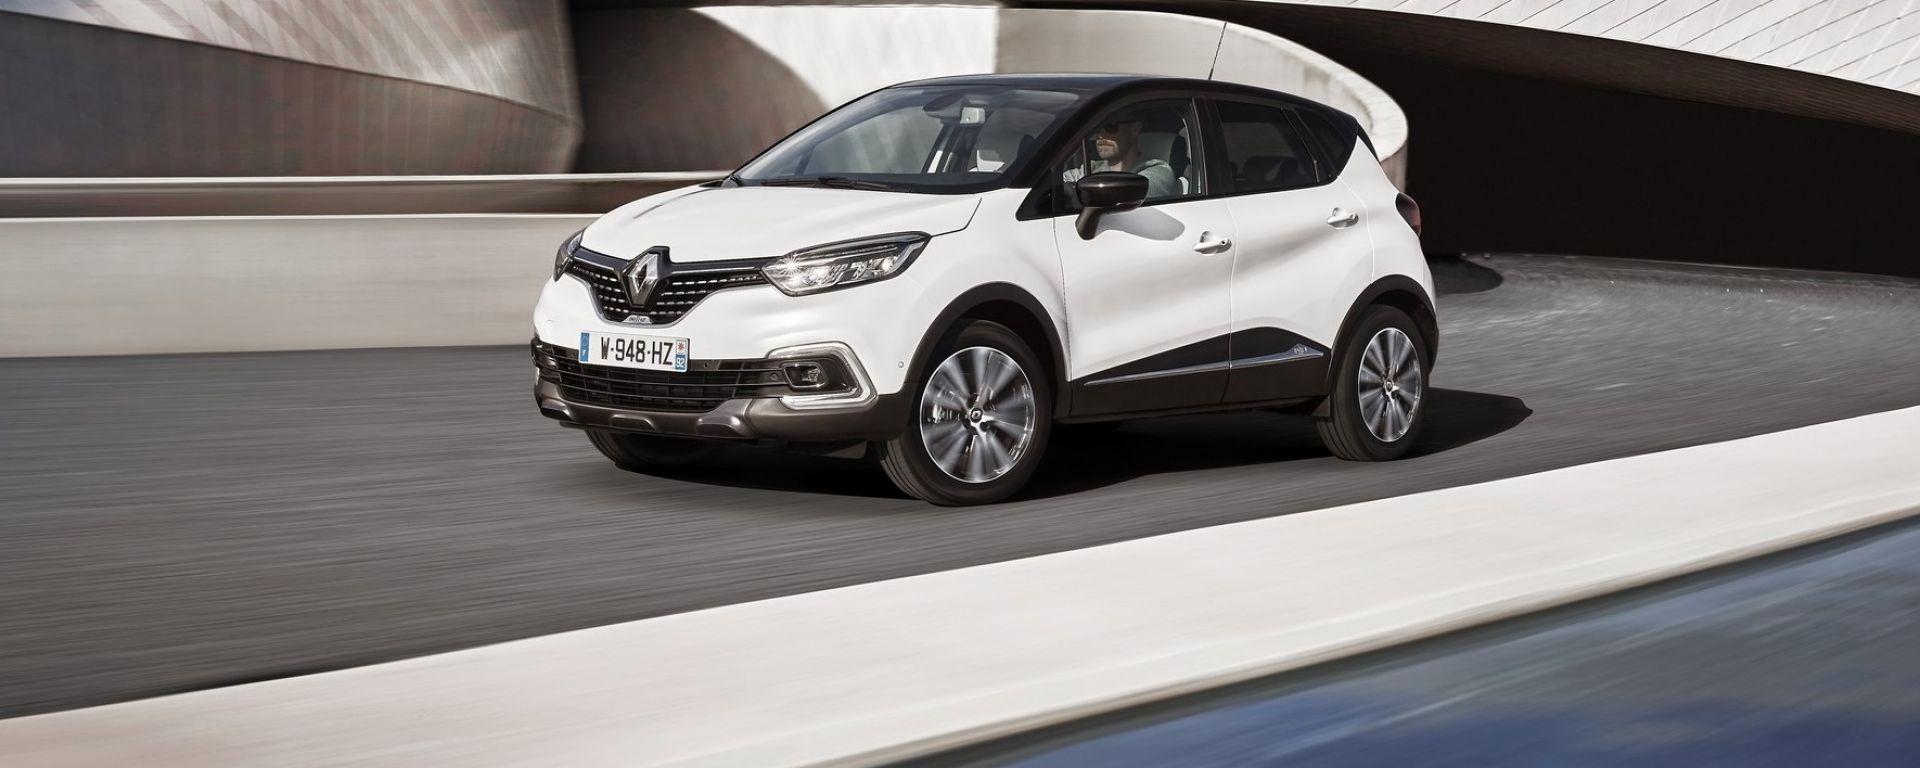 Nuova Renault Captur 2017